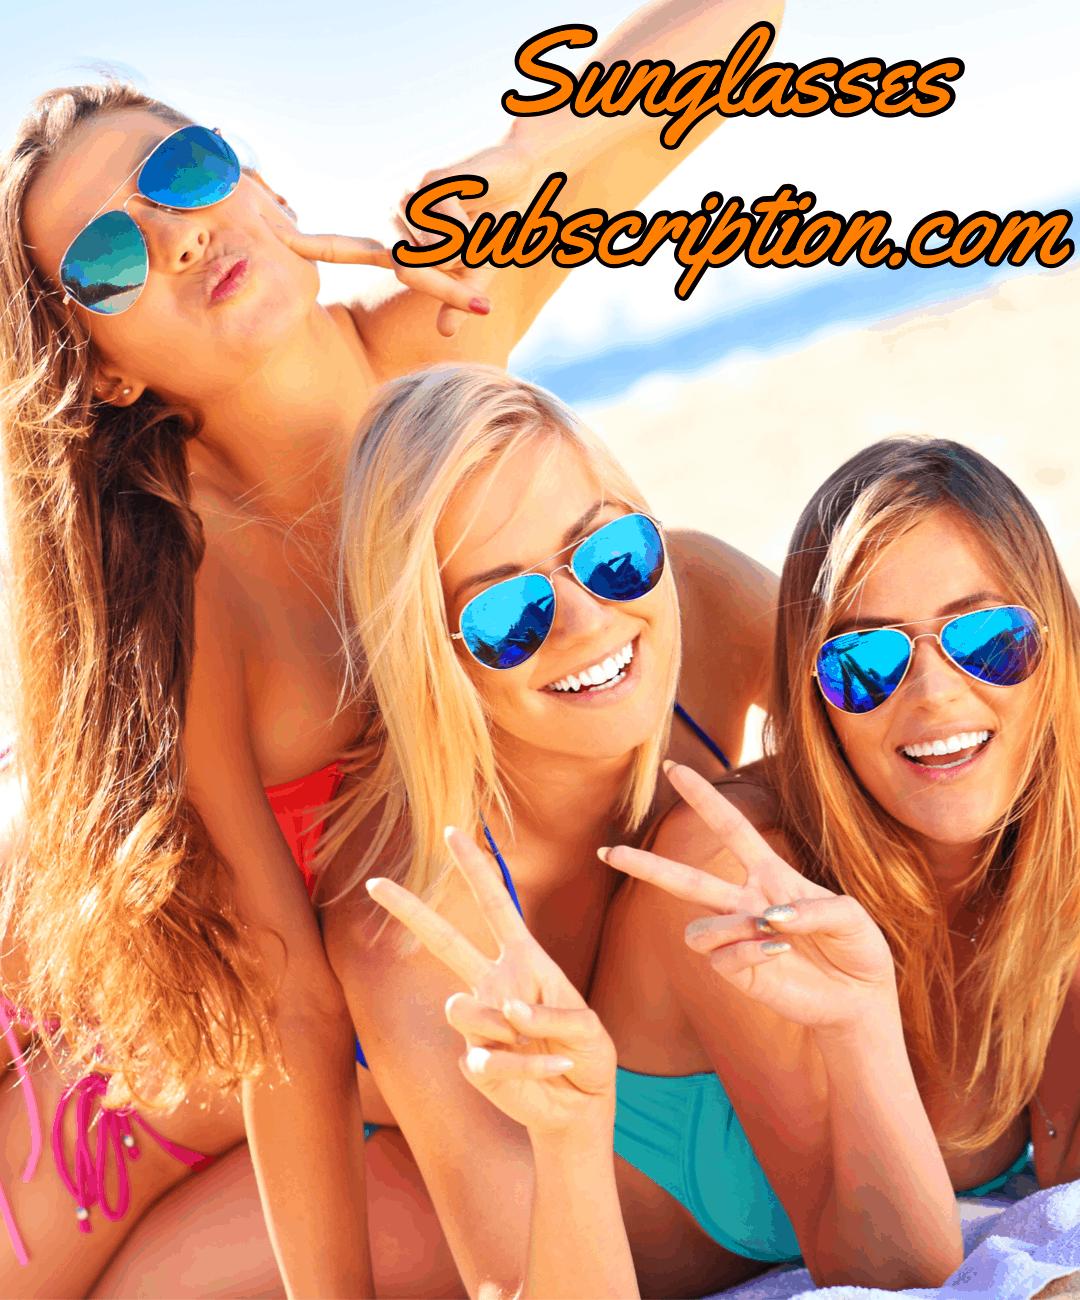 BEINGBAR Eyewear - Sunglasses subscription.com